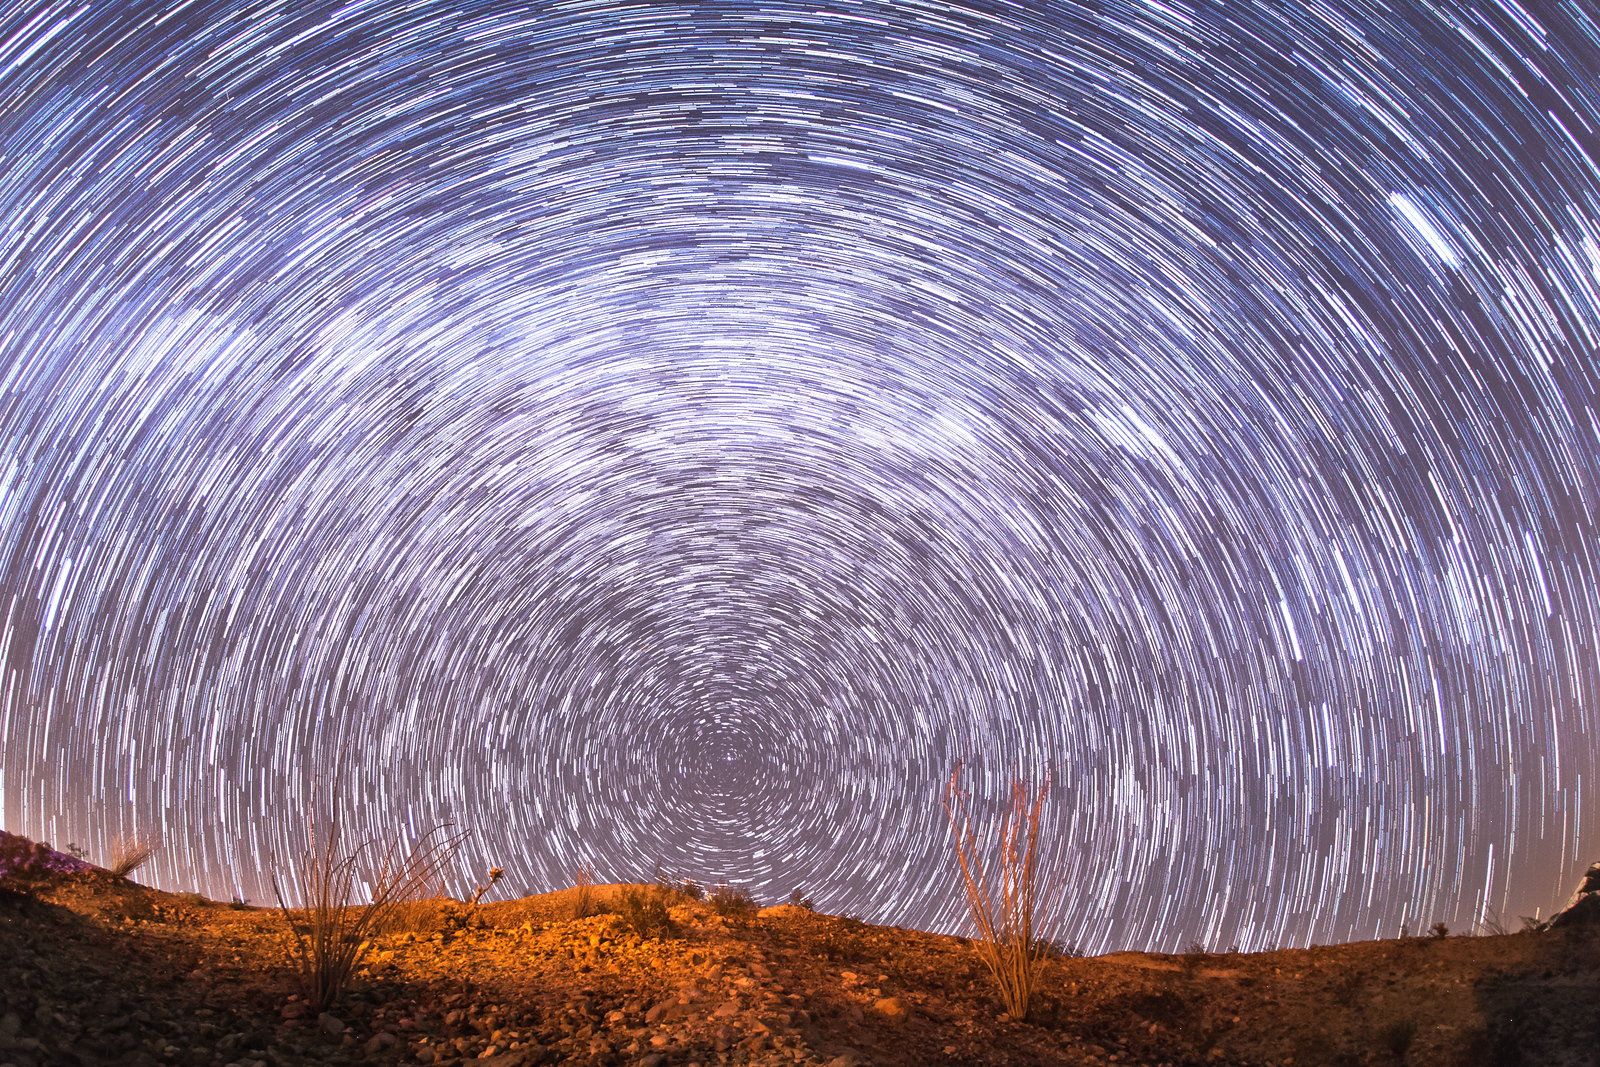 Star trails above Anza-Borrego Desert State Park